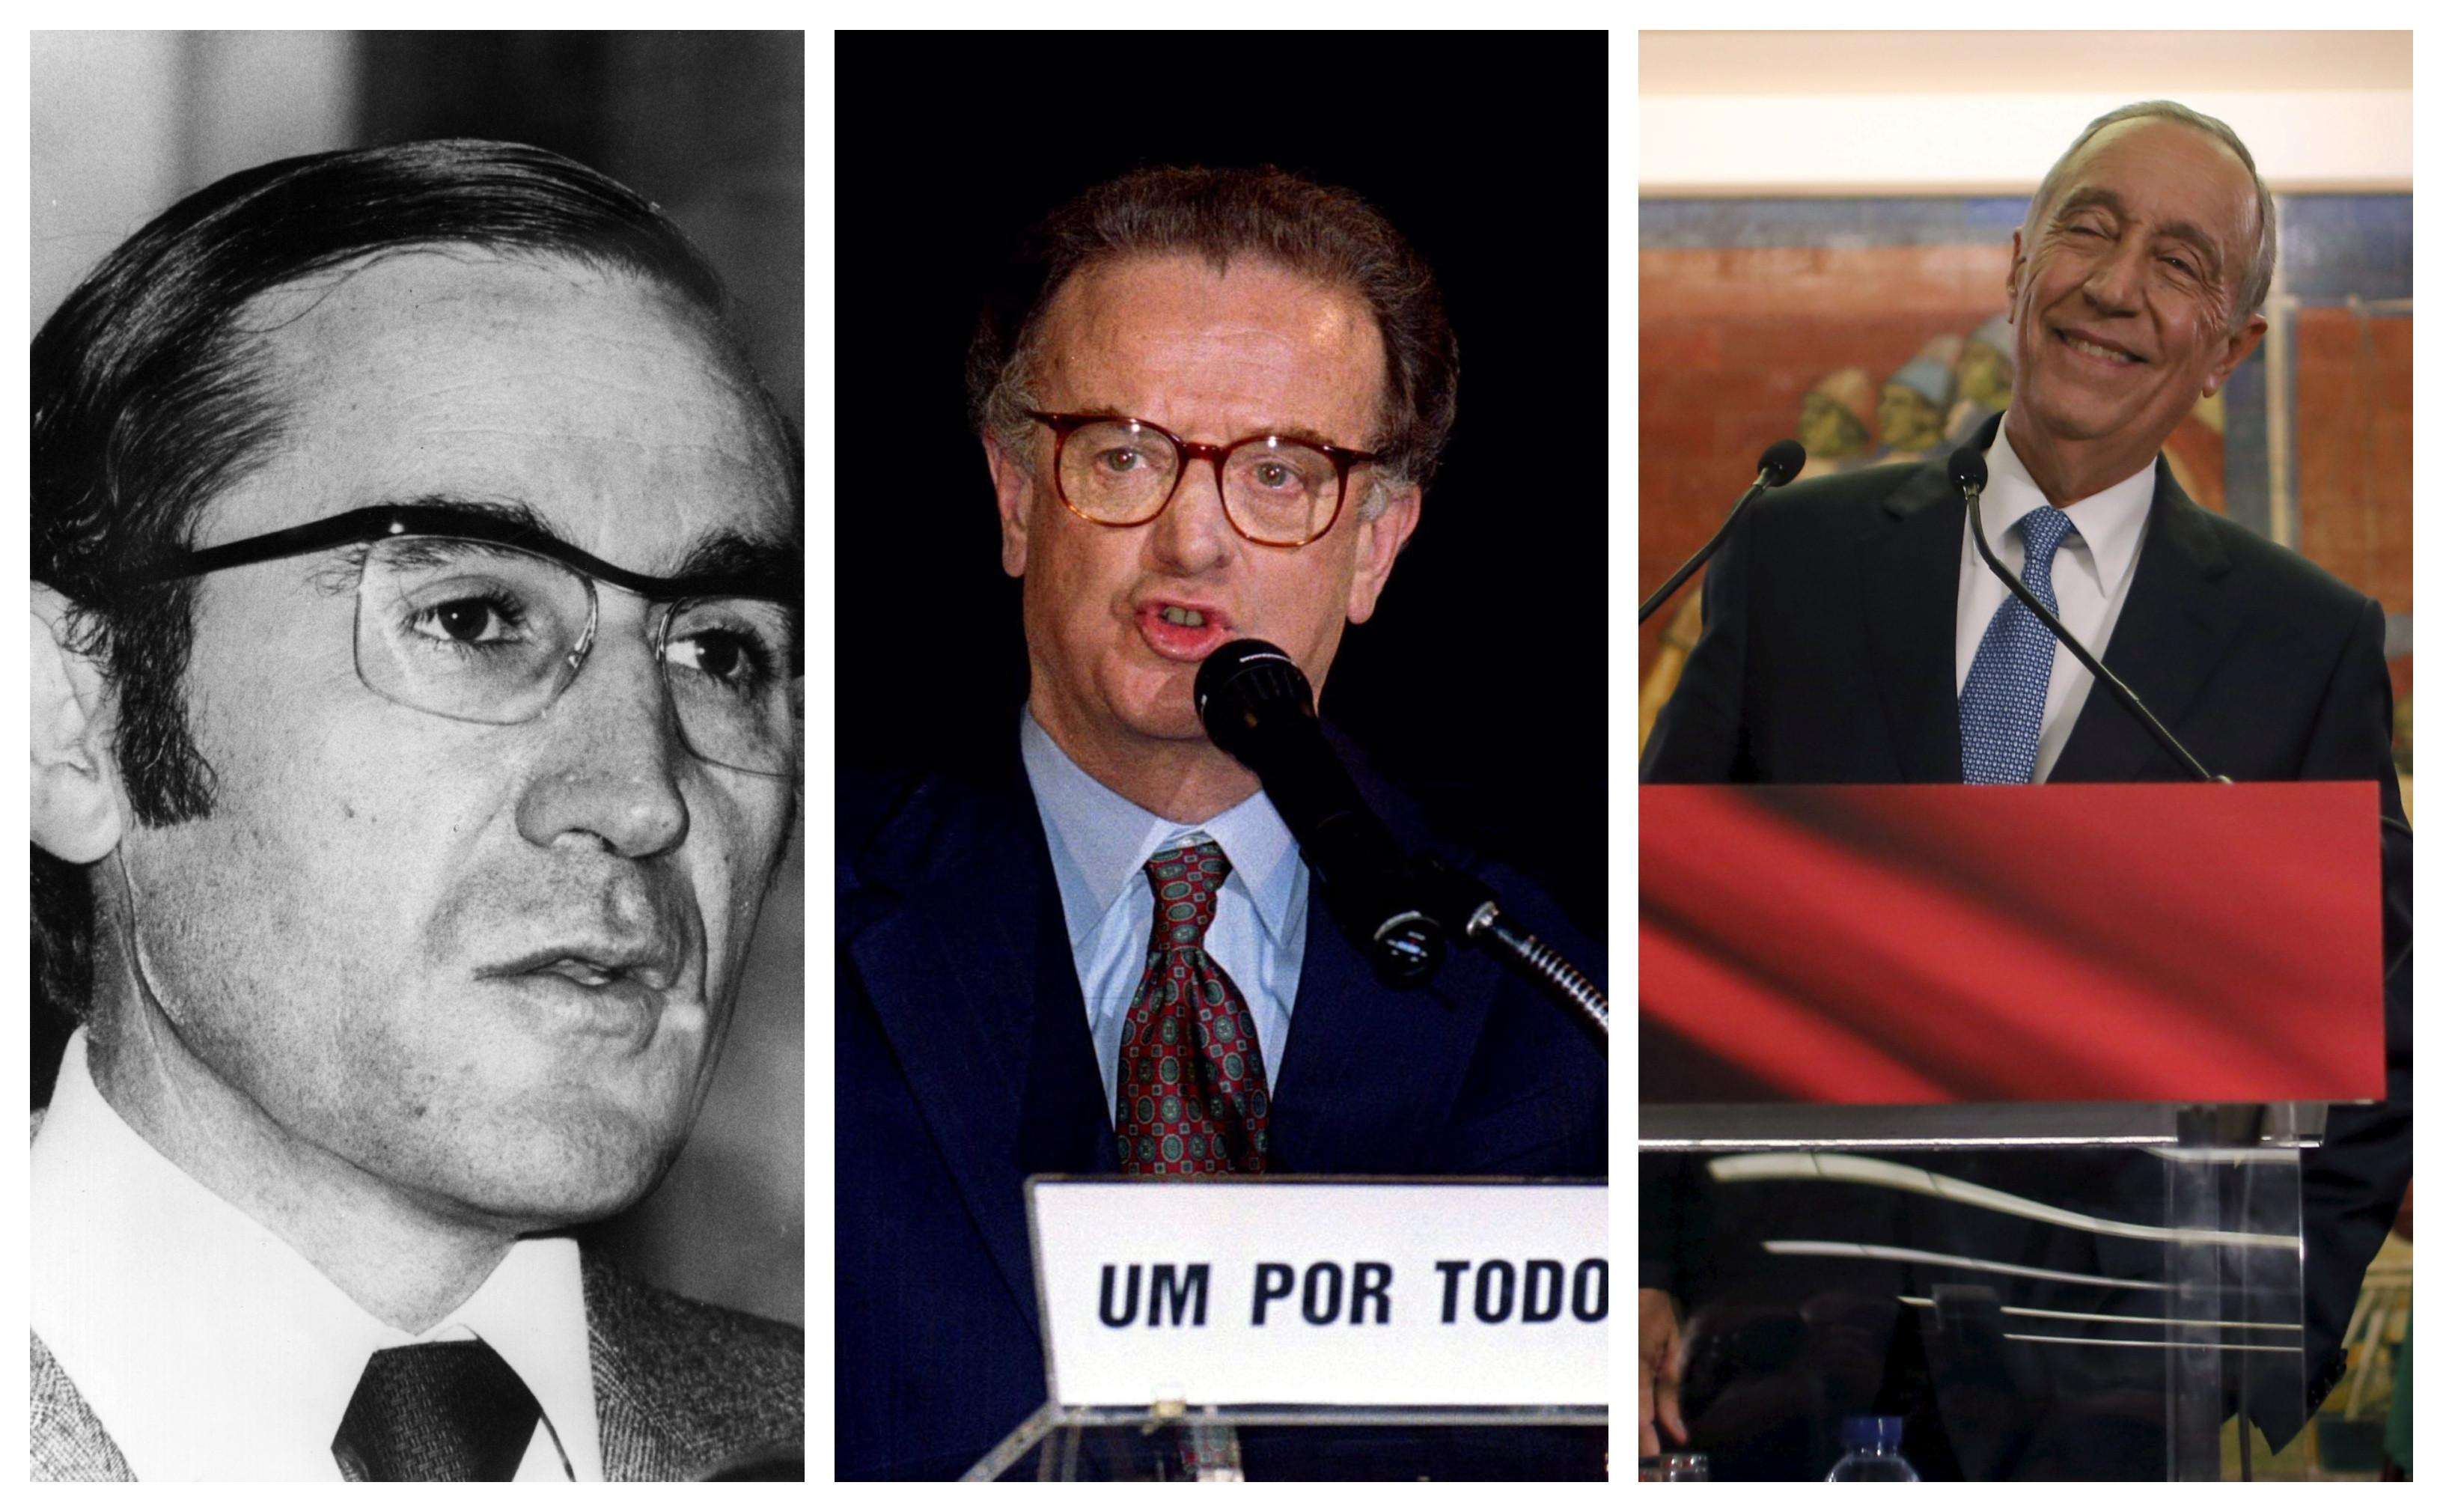 Lembra-se de todos os Presidentes que tivemos desde o 25 de Abril?